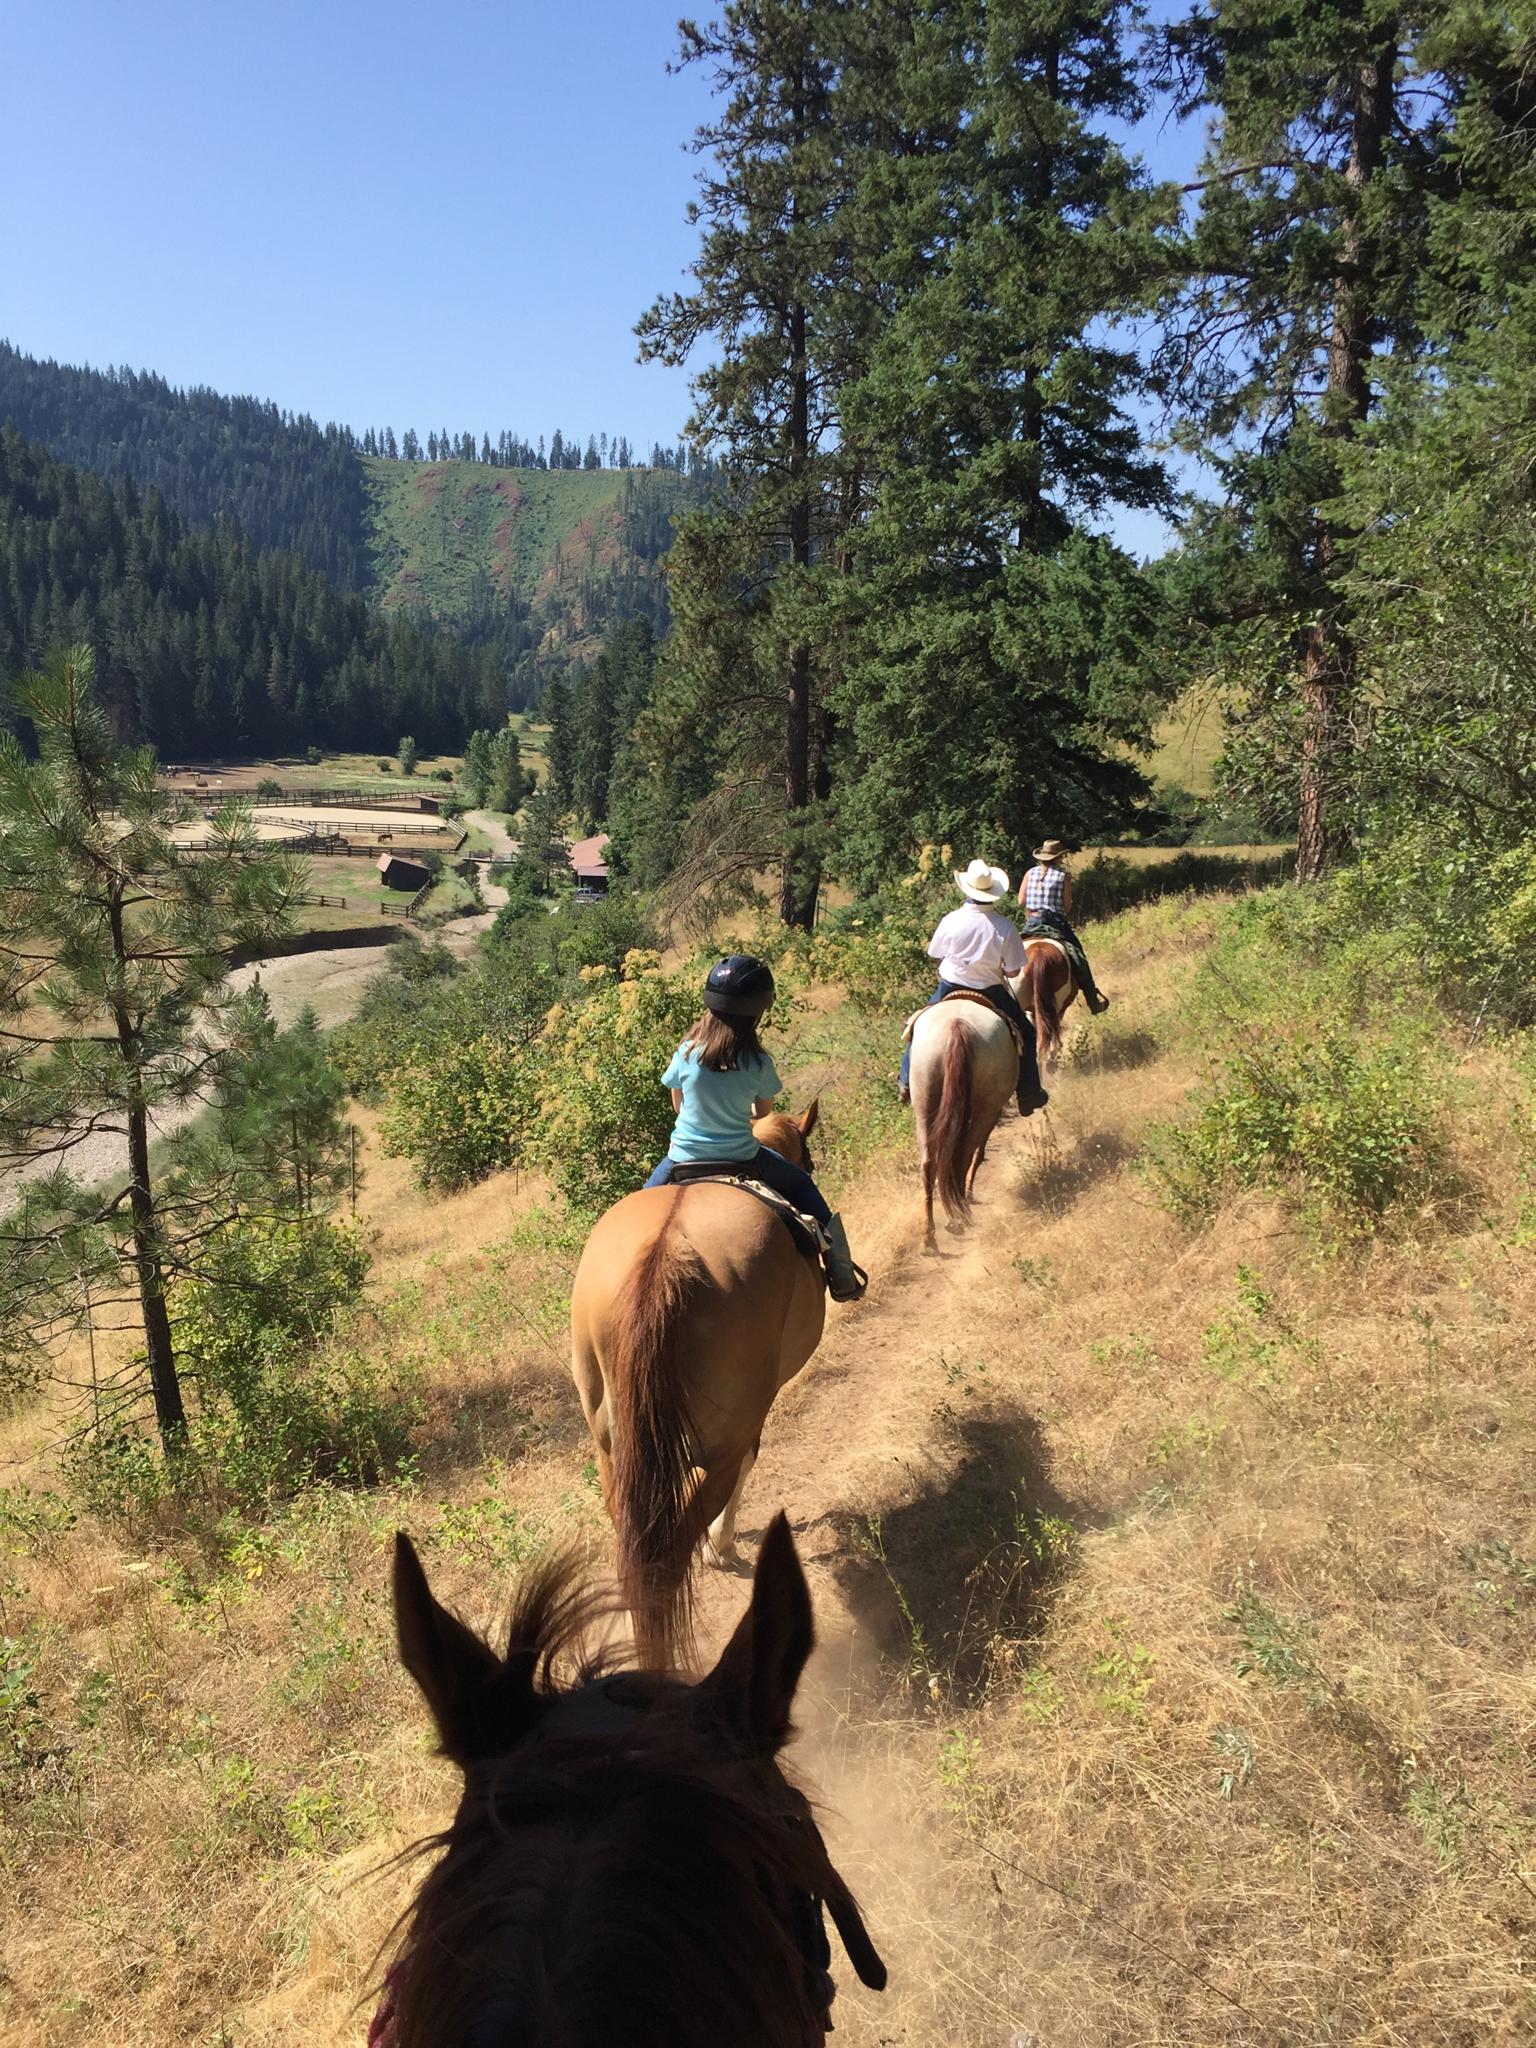 Group on horseback trail ride near ranch.